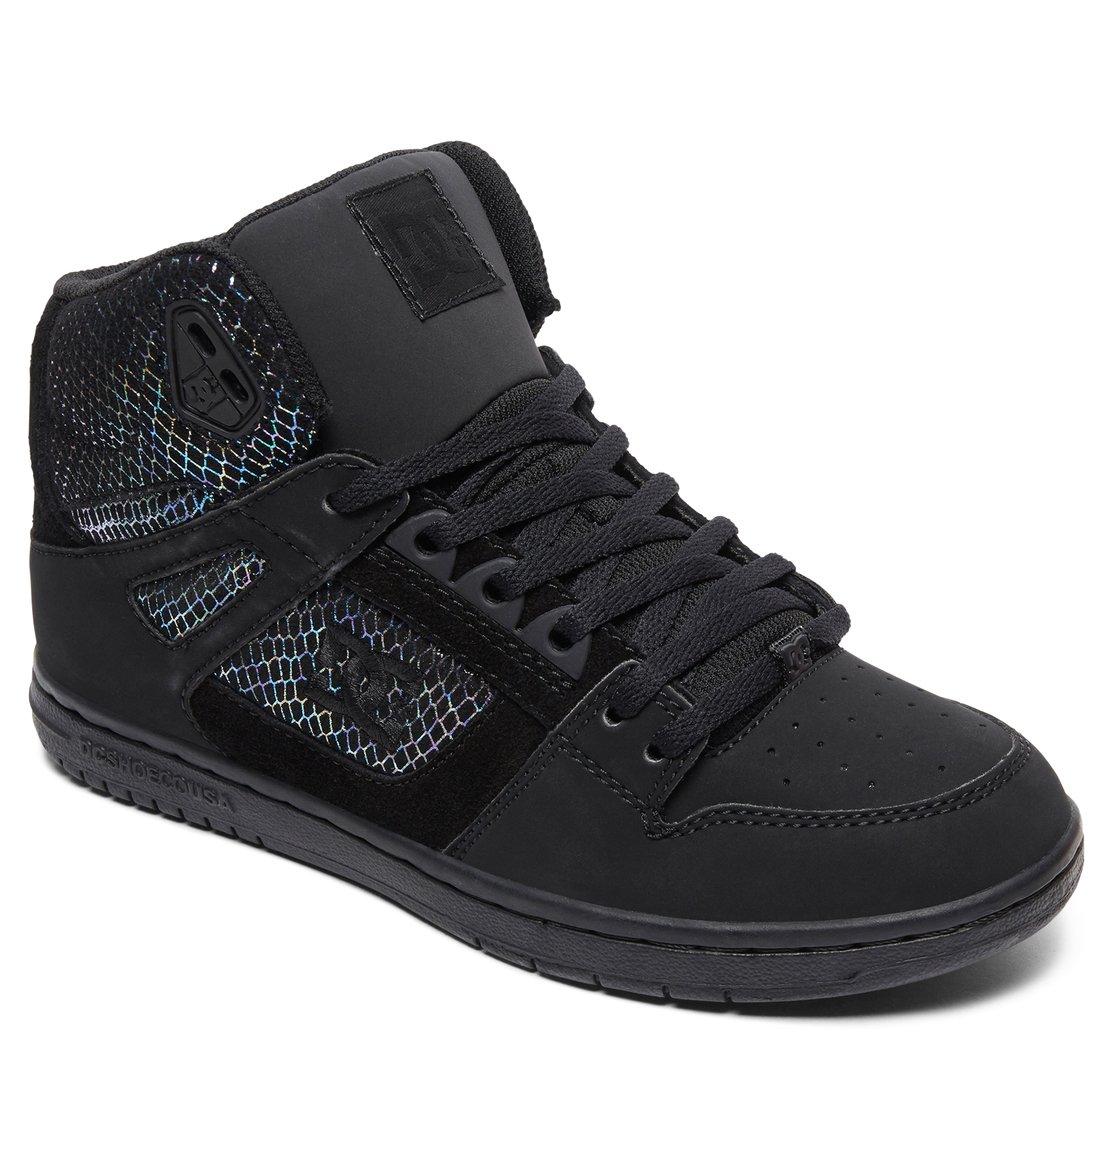 e43f3079b8a779 1 Women's Pure SE - High-Top Shoes ADJS100116 DC Shoes